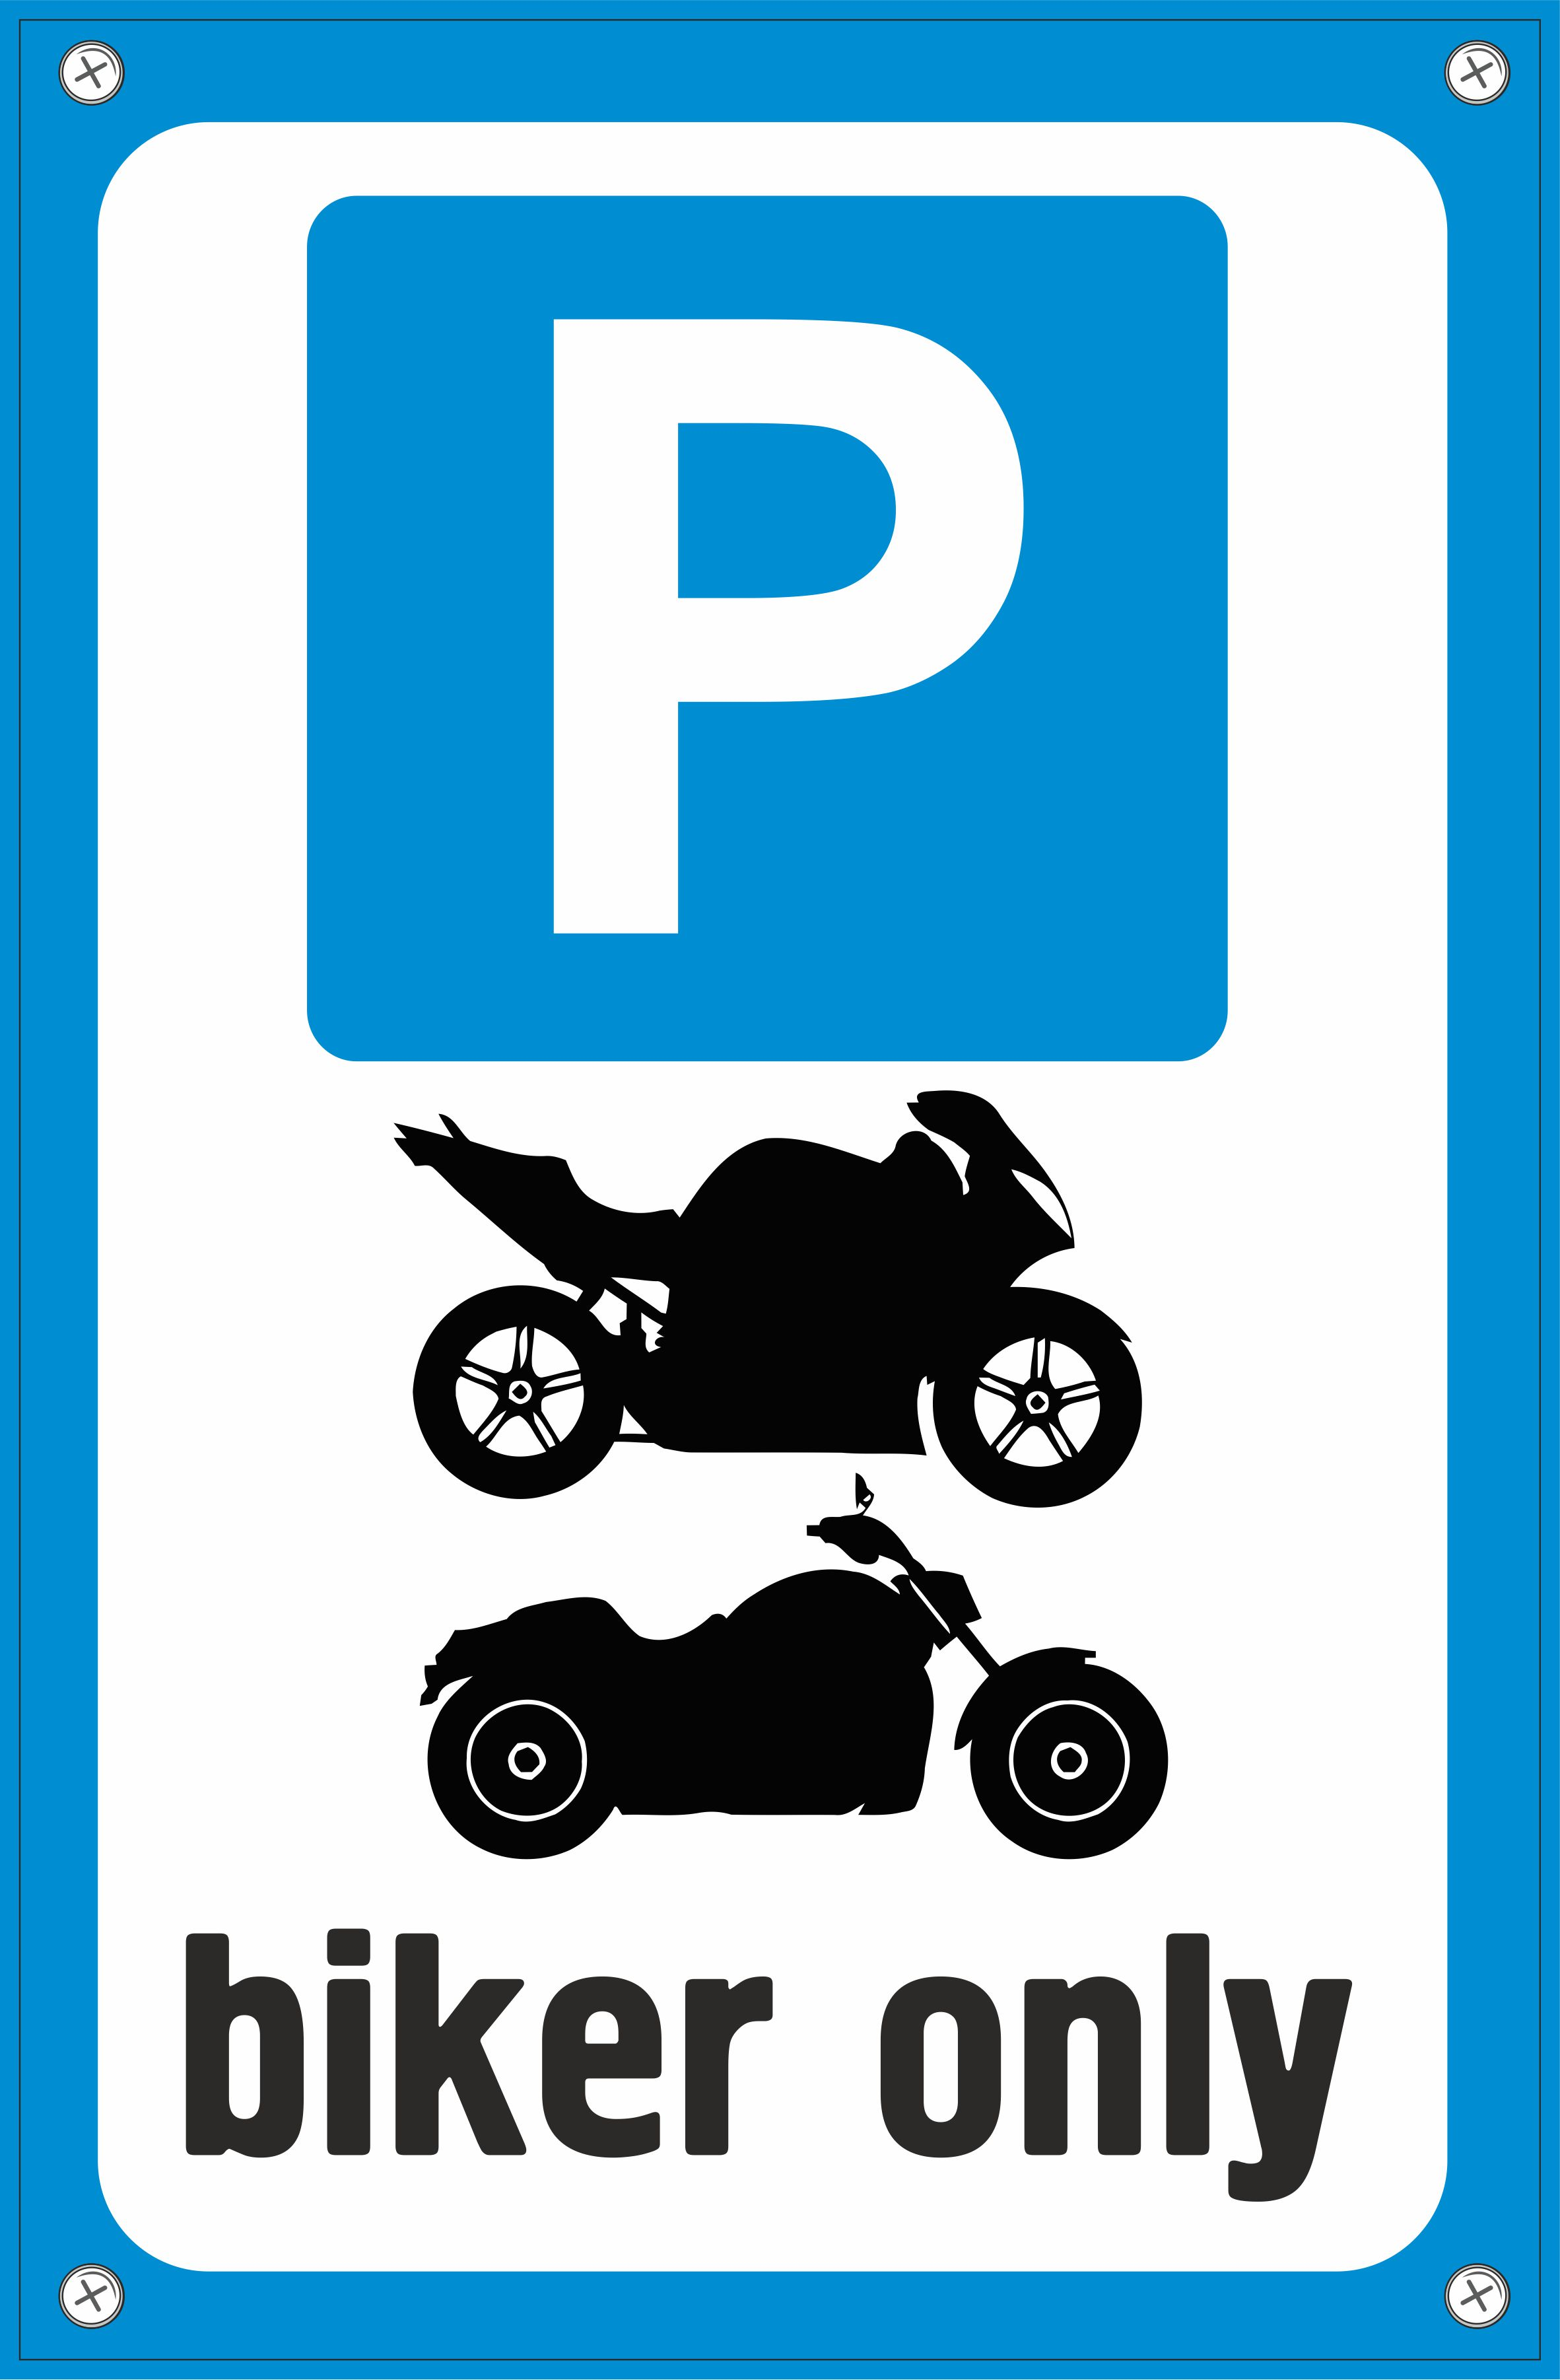 Табличка TPS 024 Парковка байкер, пластик 3 мм,30*19,5 см табличка tps 004 собака без привязи пластик 3 мм 30 19 5 см